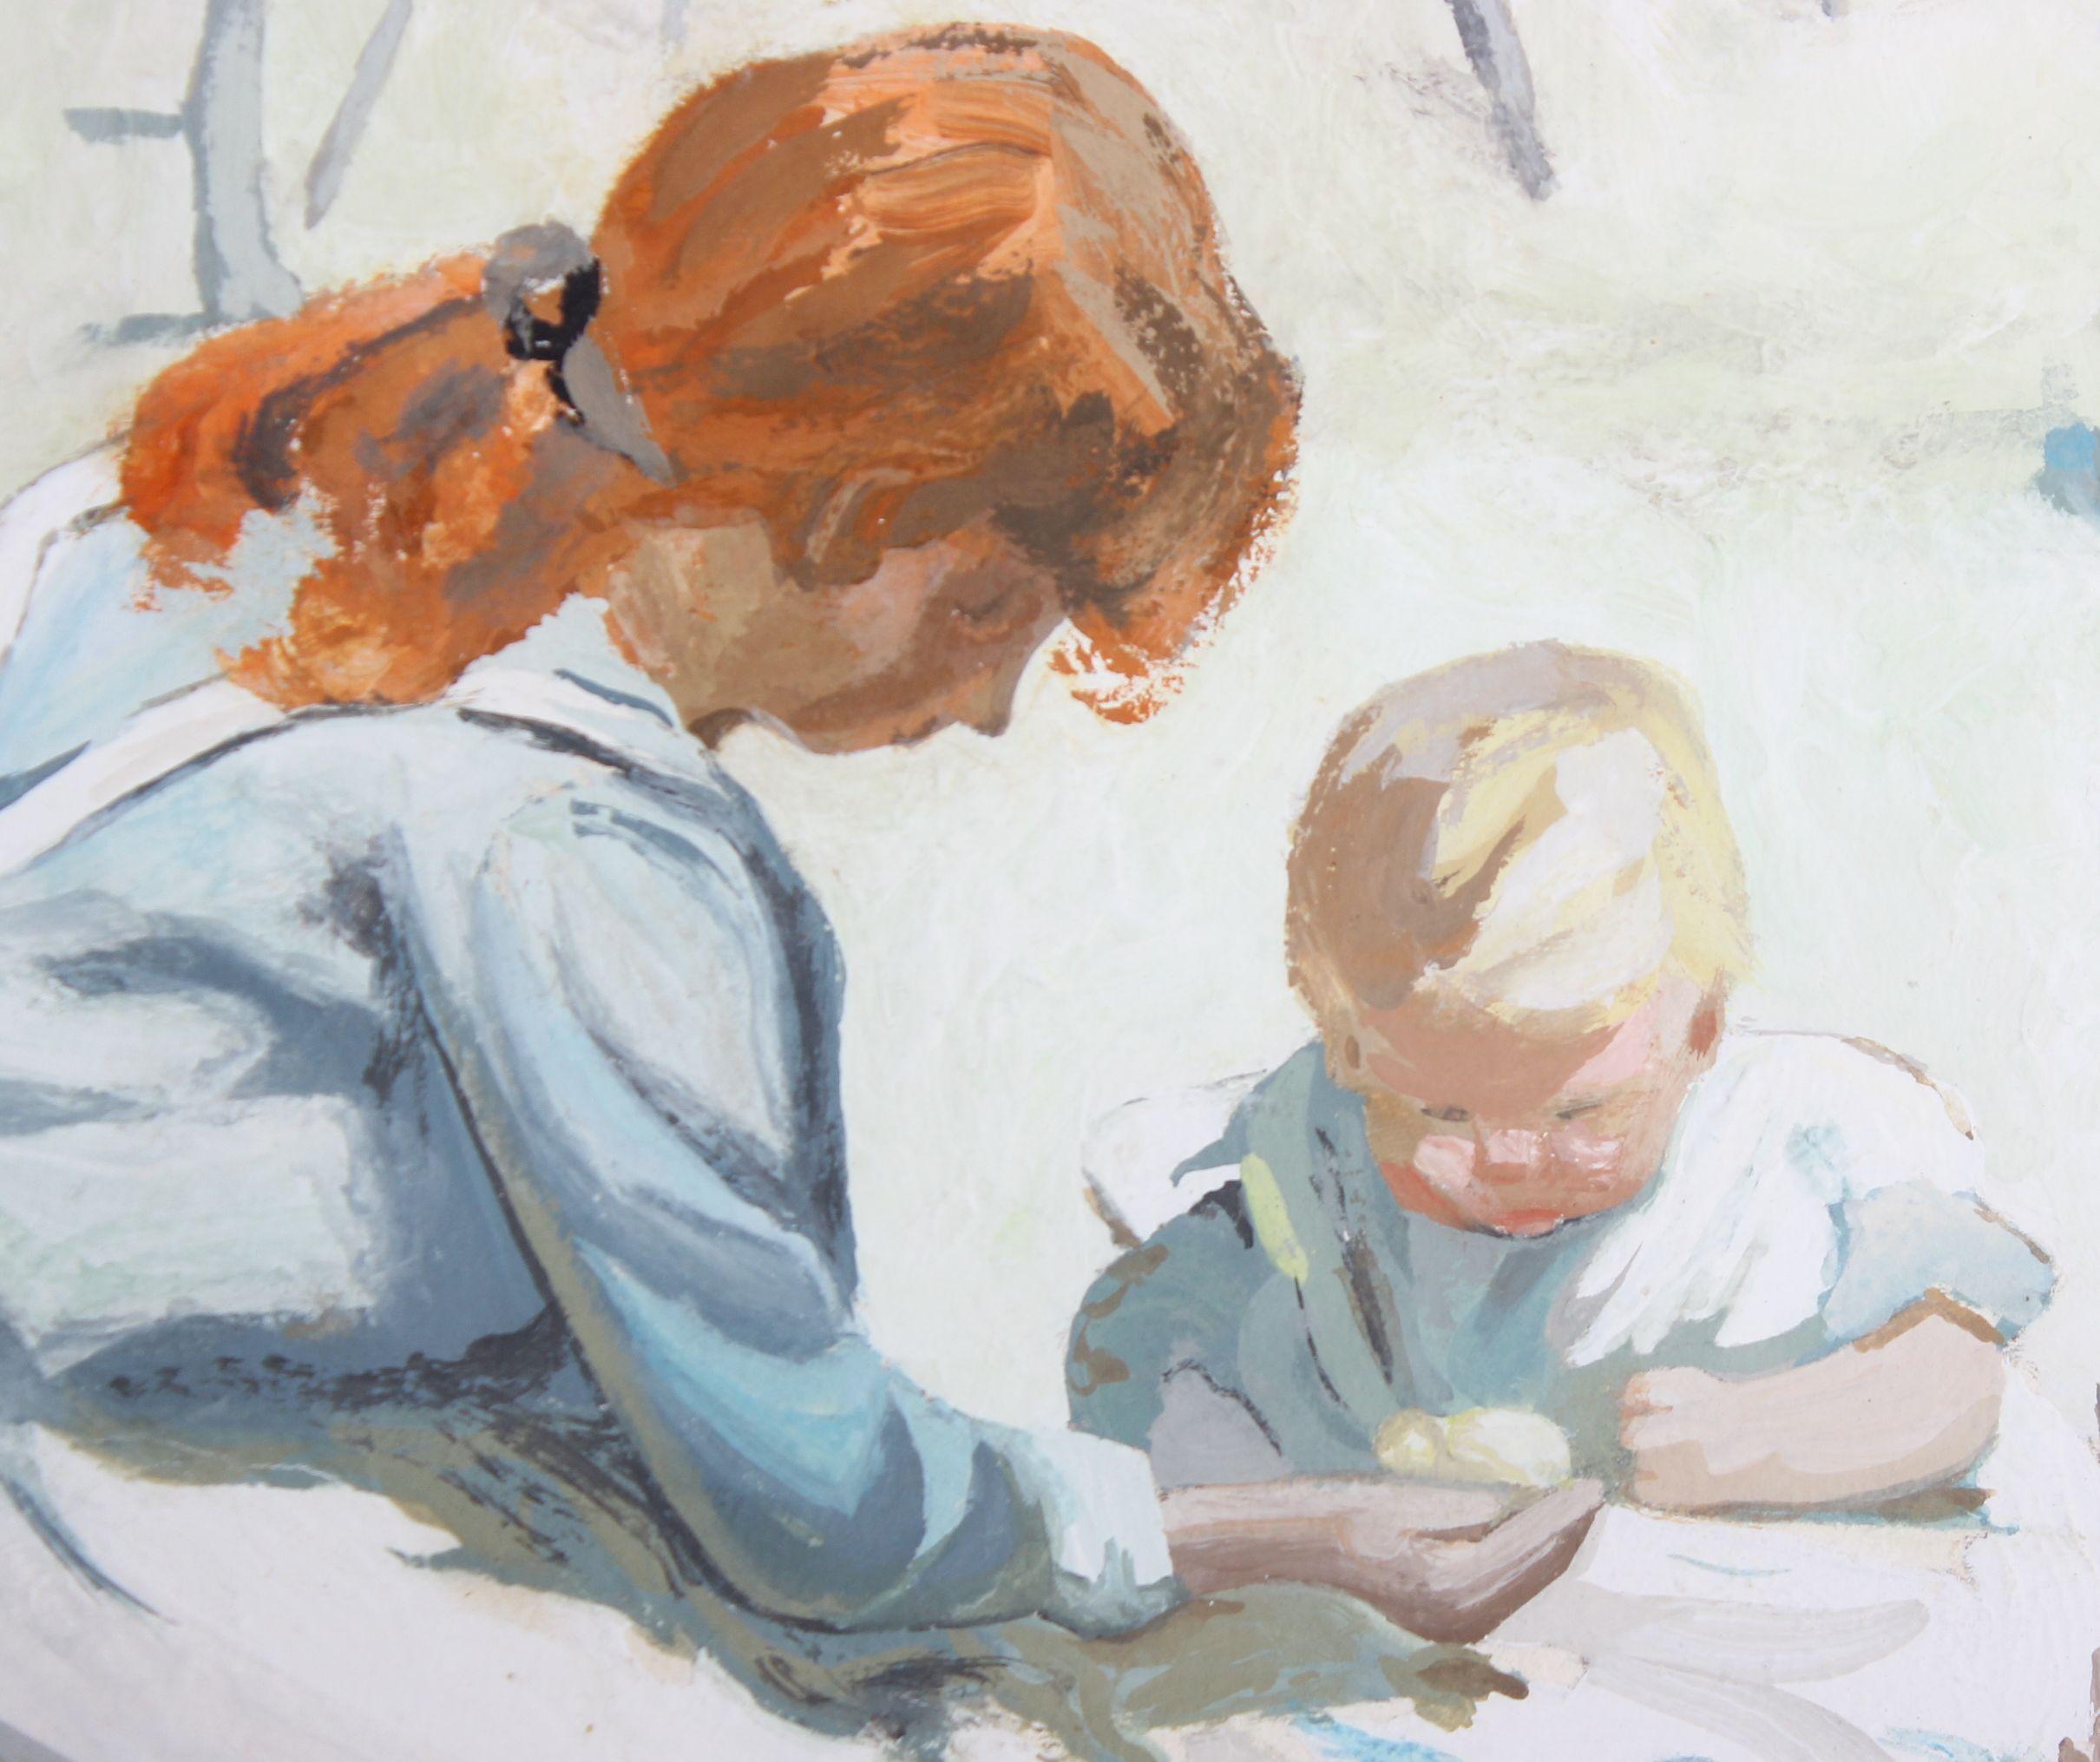 Lot 129 - Dorothea Sharp ROI, RBA (British, 1874-1955), 'Feeding the Chickens'. Oil on board, signed